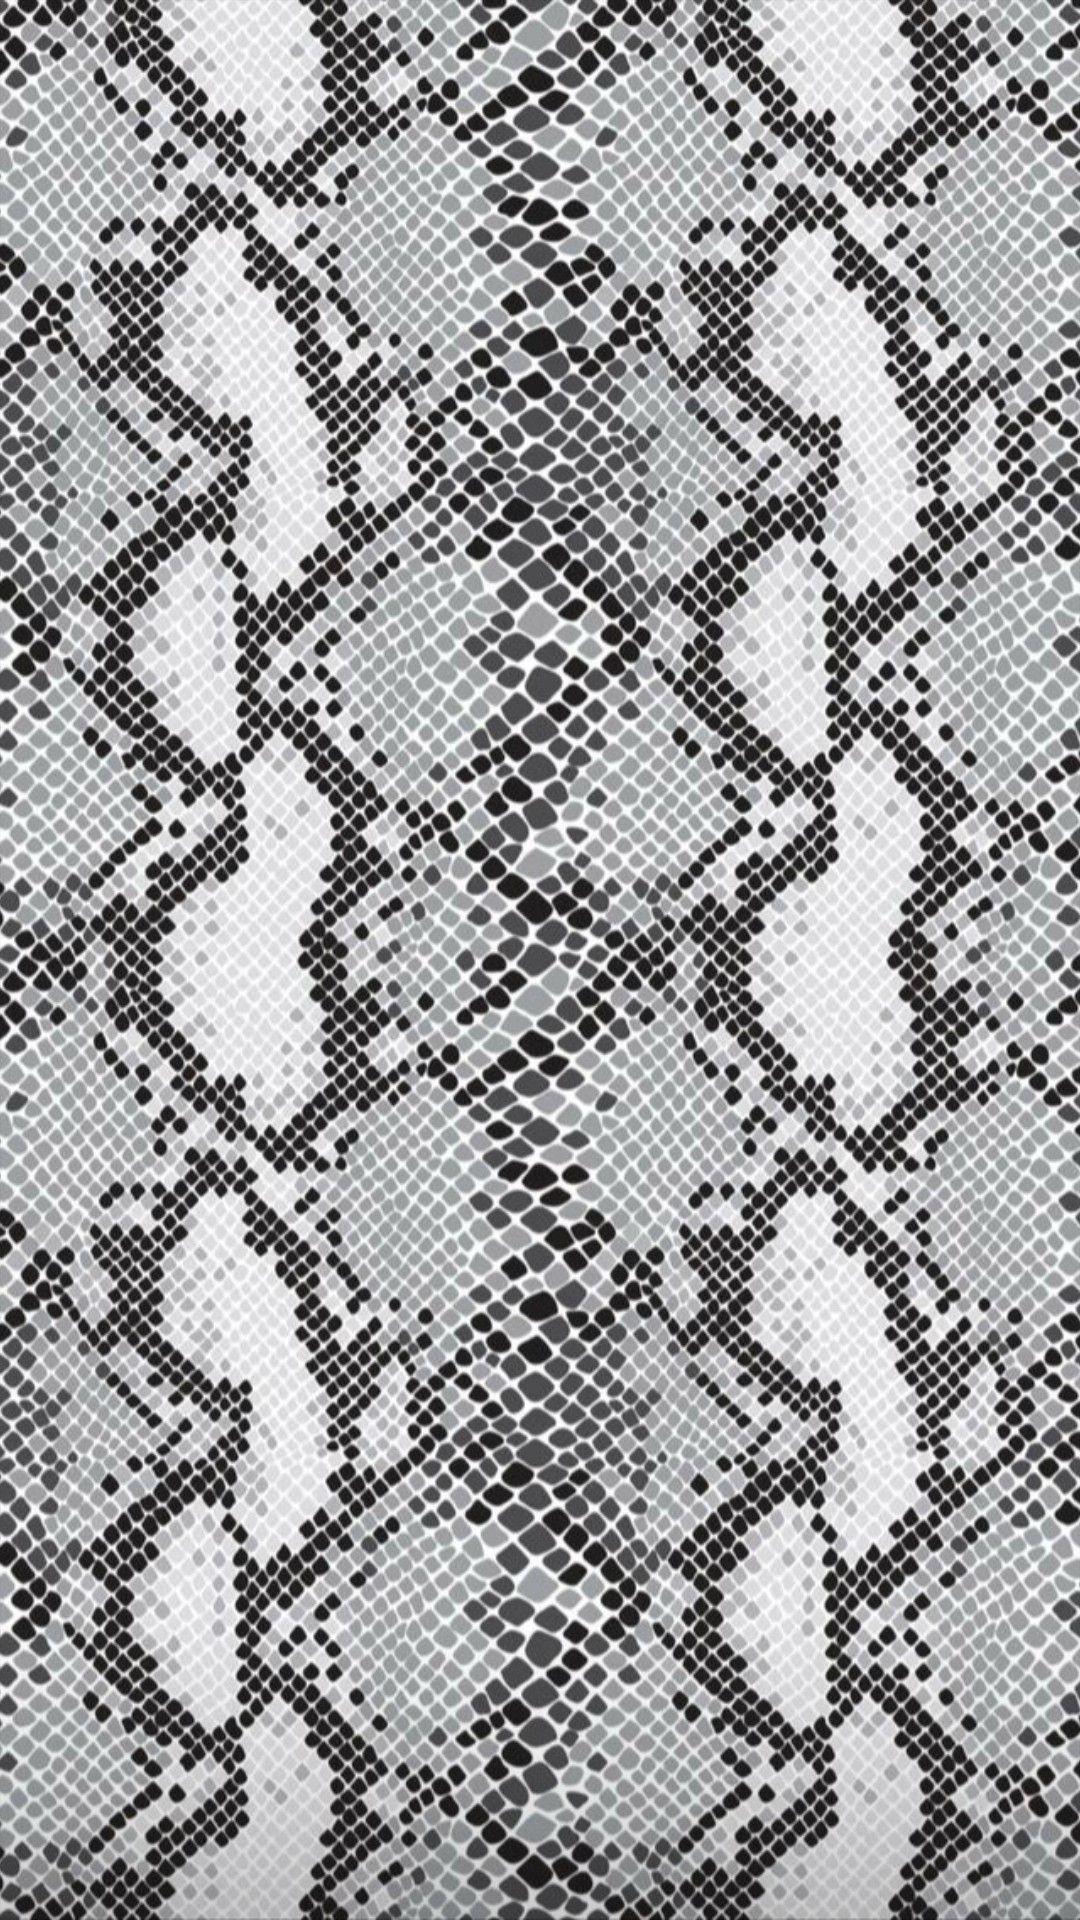 Wallpaper in 2020 Animal print wallpaper, Graphic wall